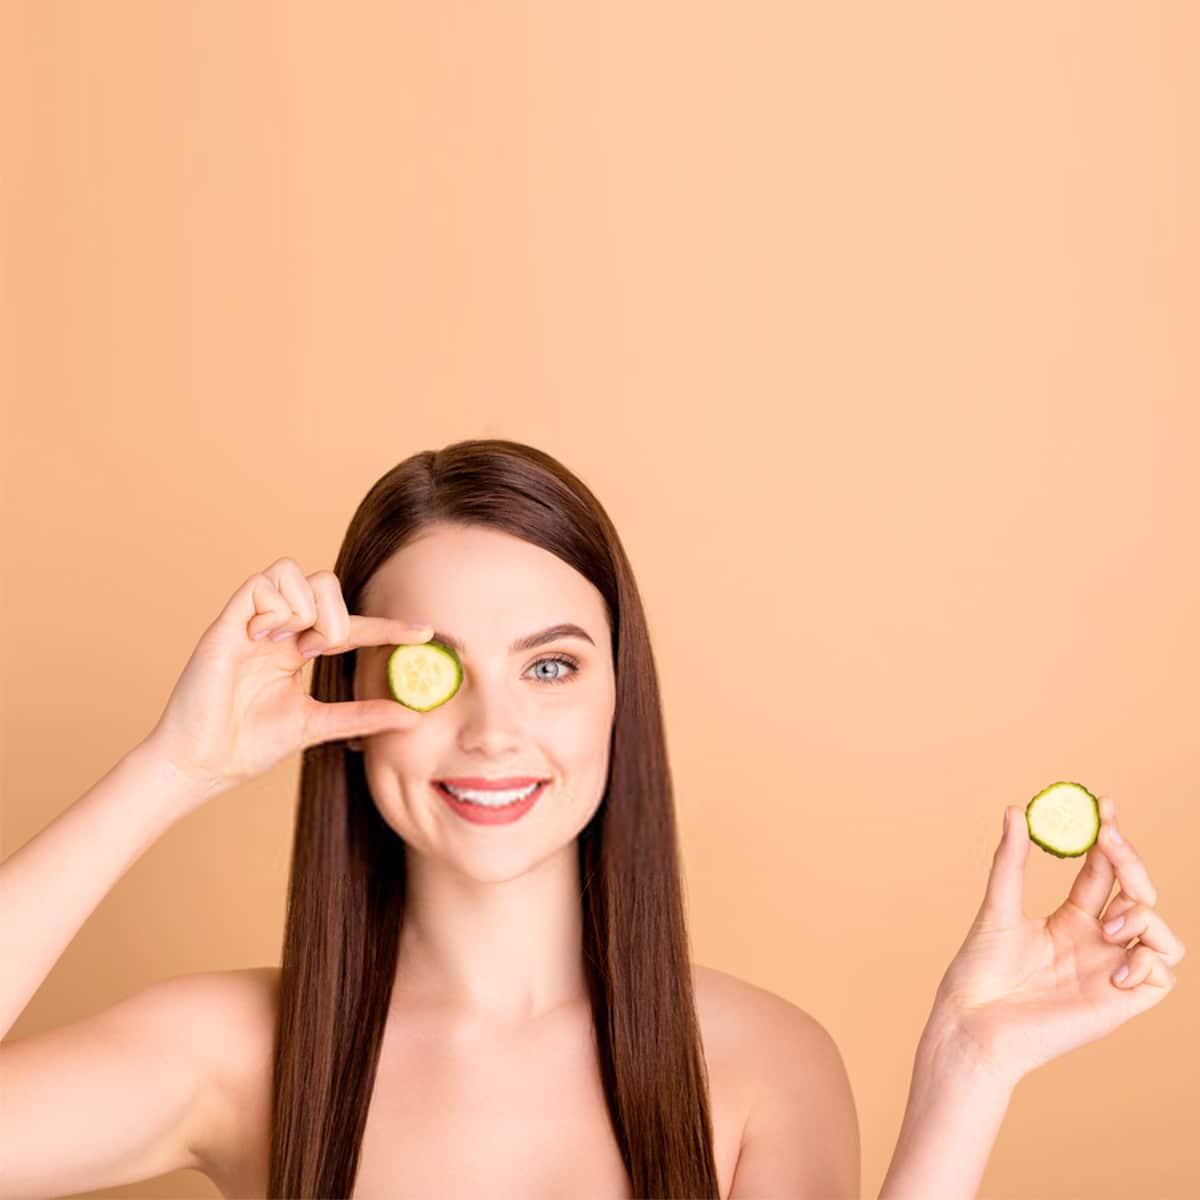 Cucumber girl